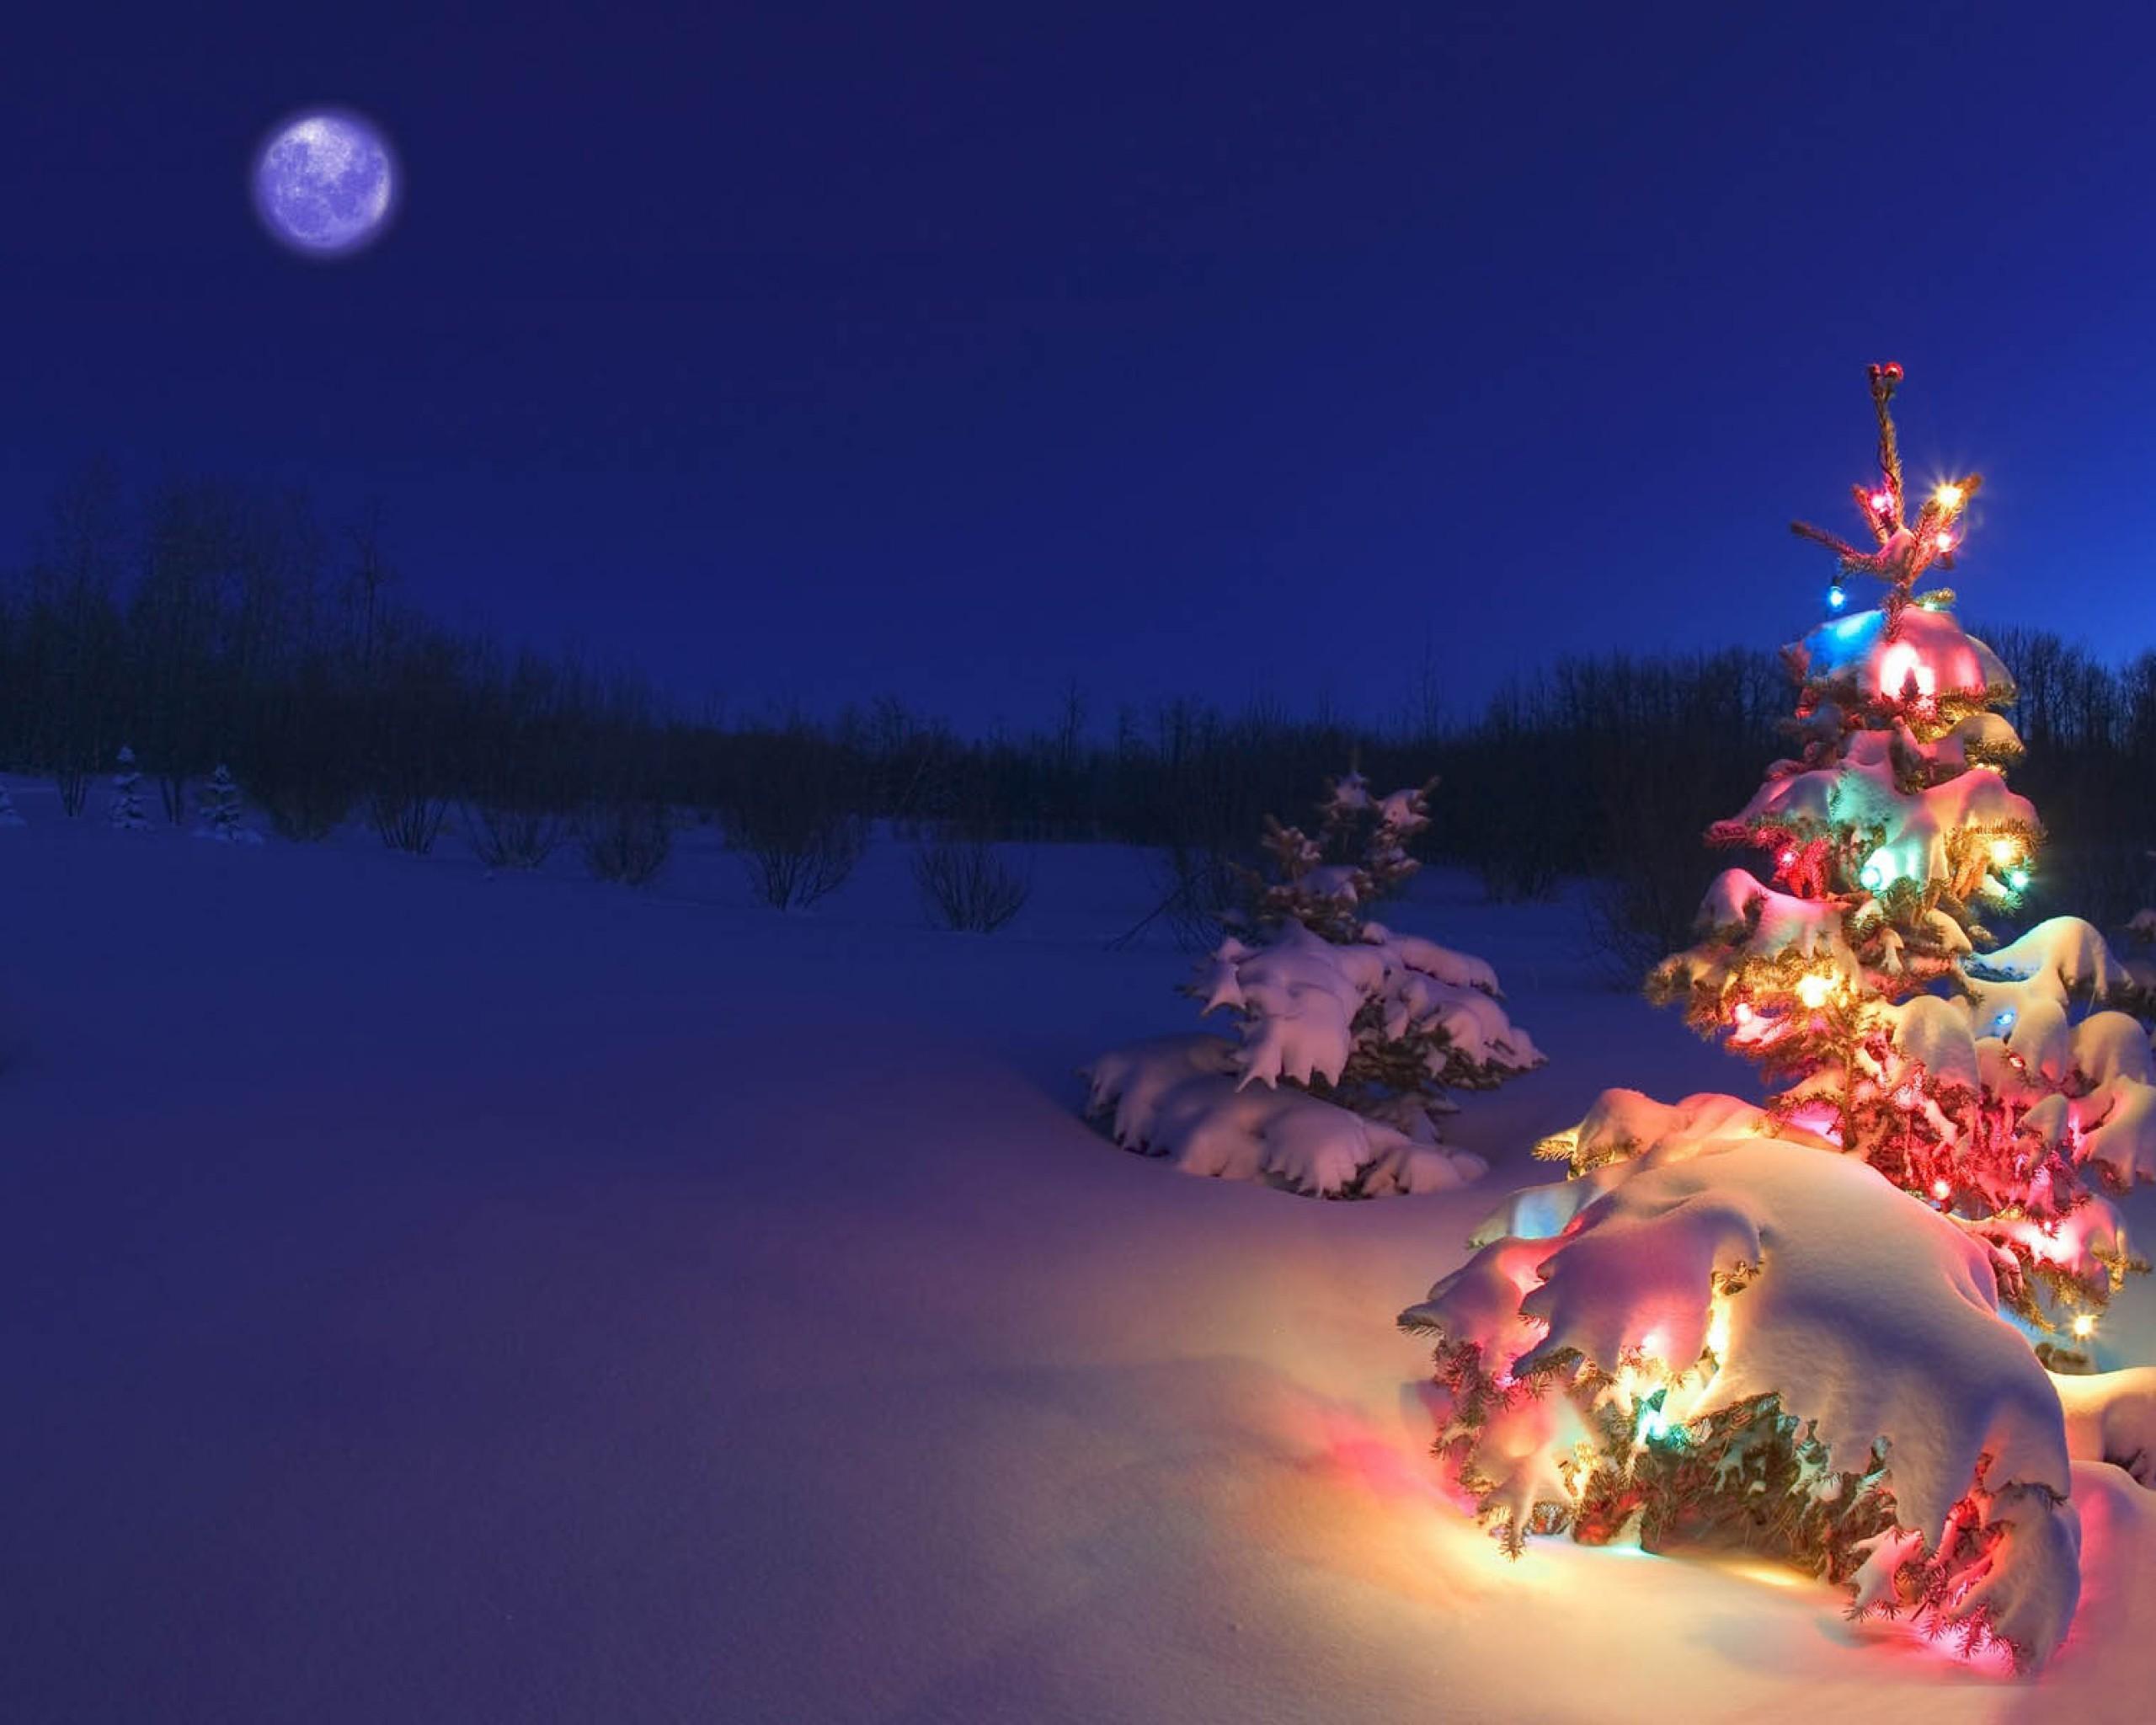 Winter Wonderland: snowy winter scenes & Christmas trees.